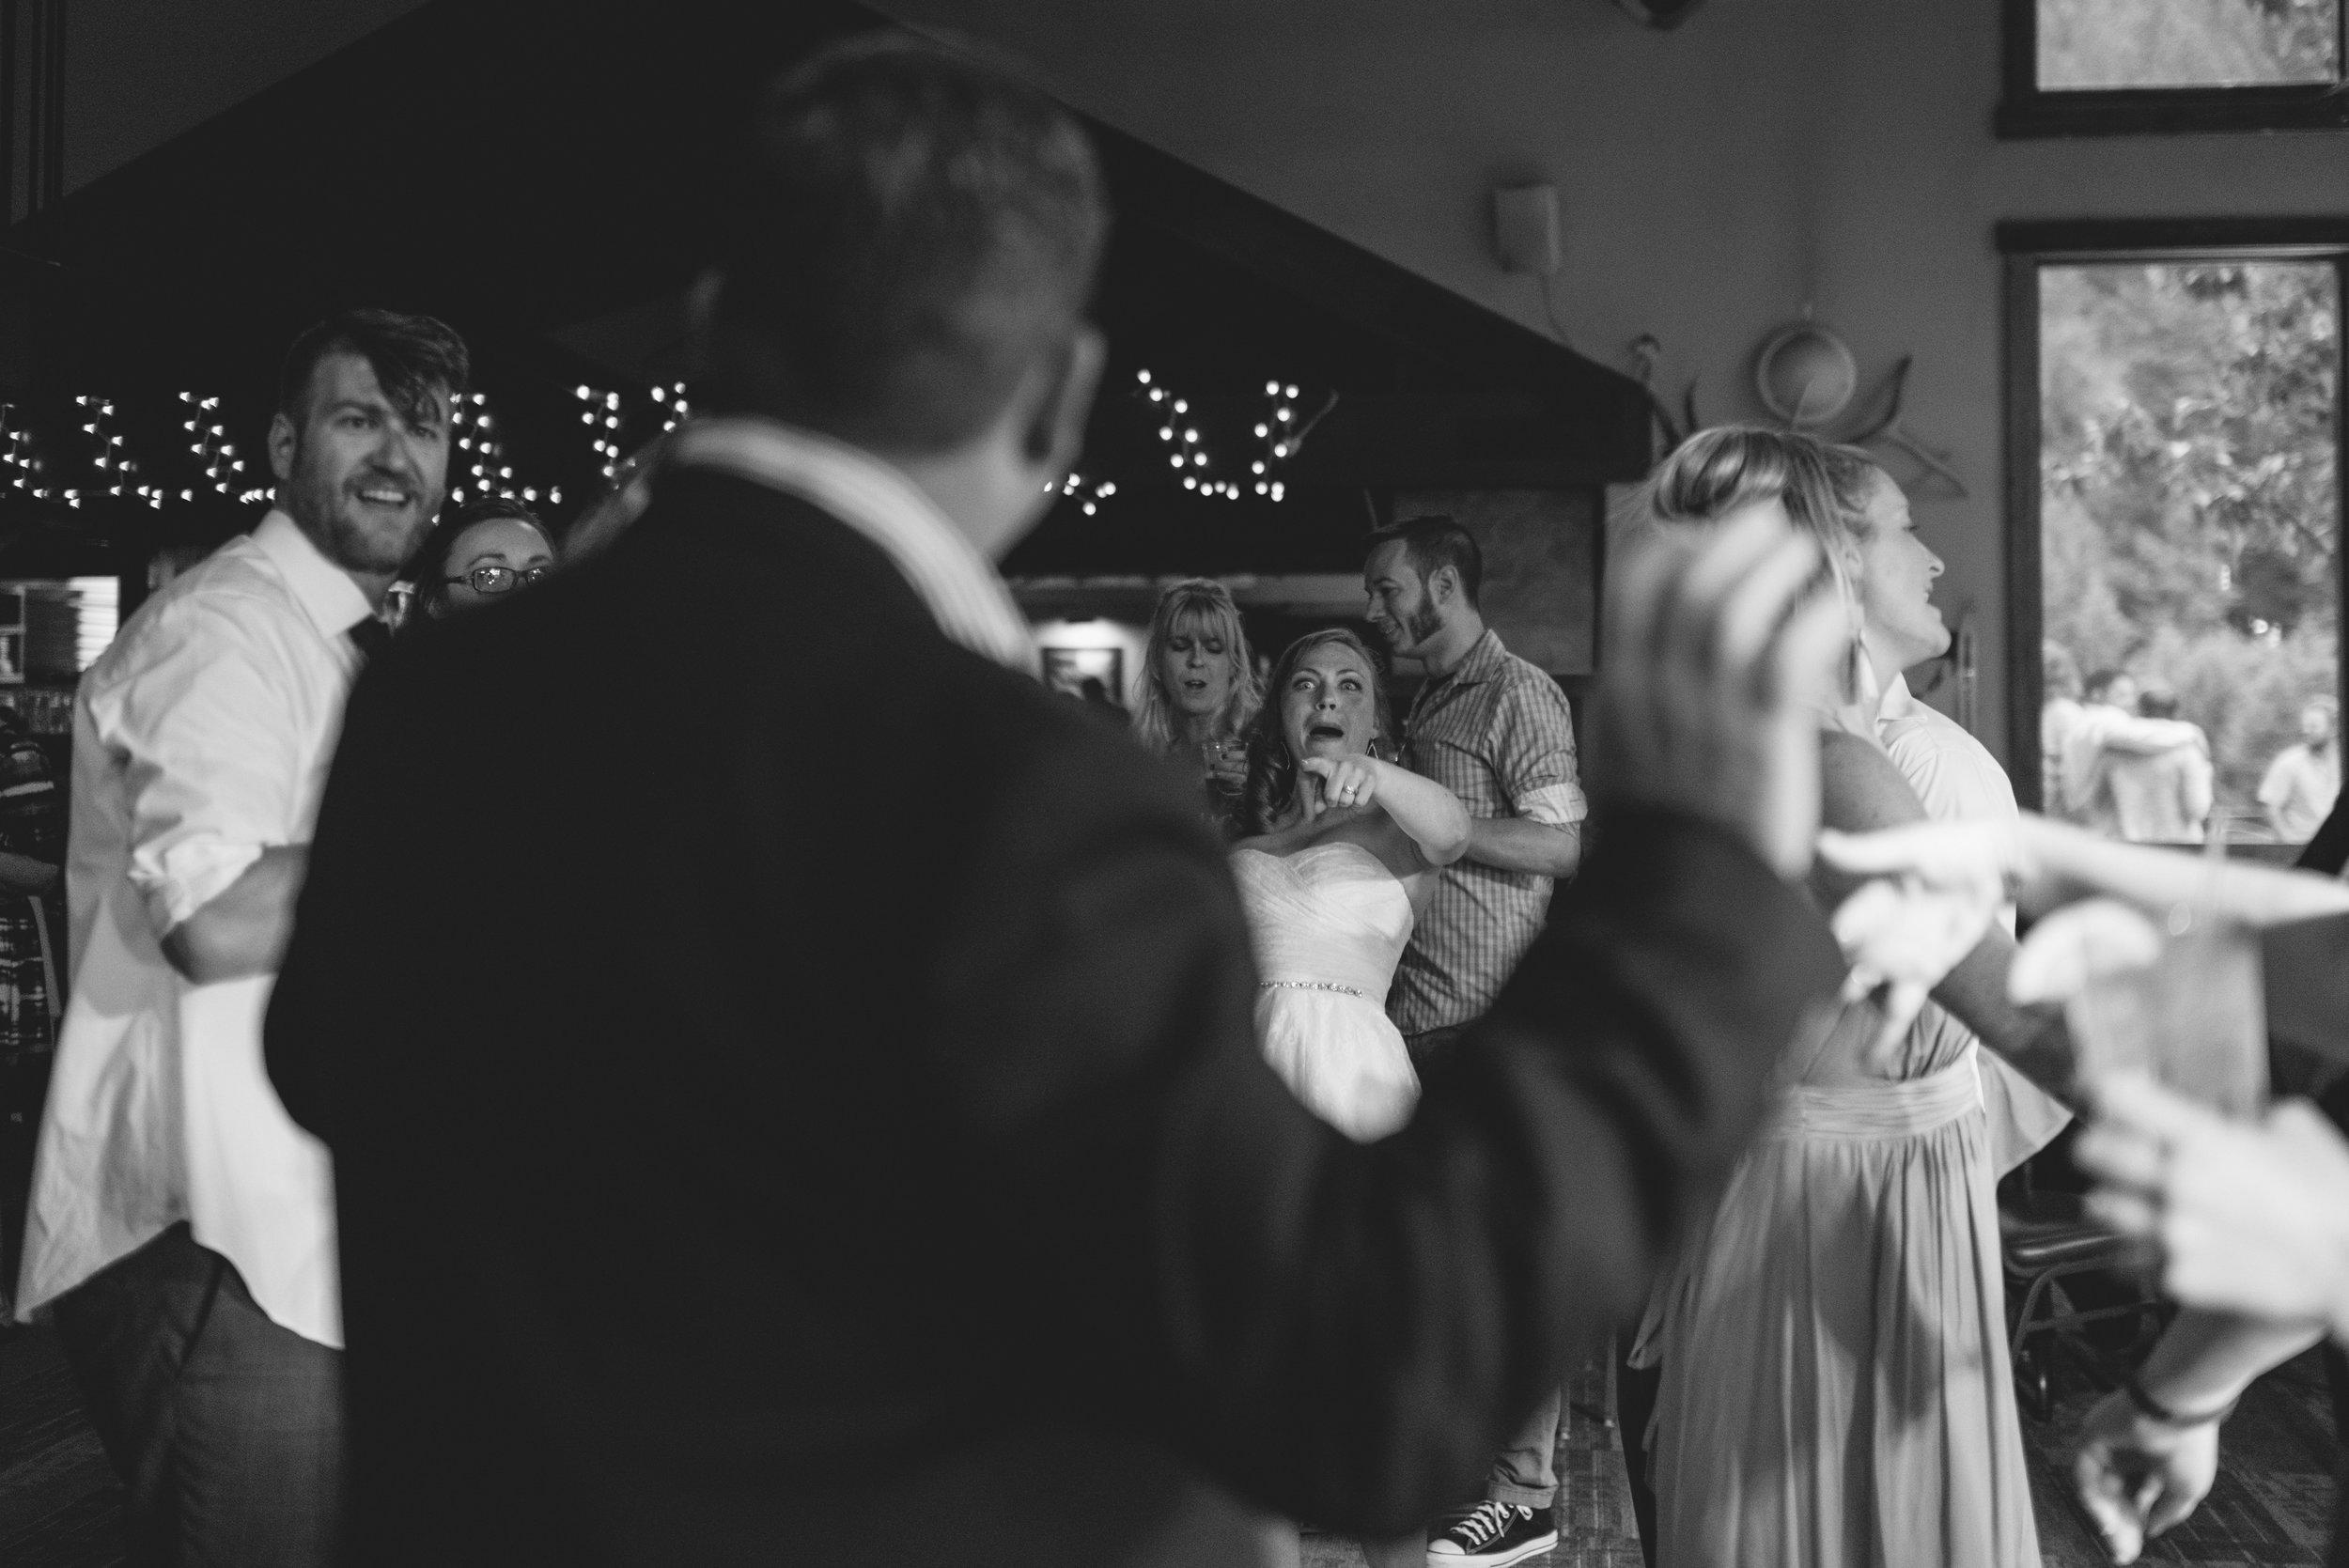 walton_dancing_05.jpg